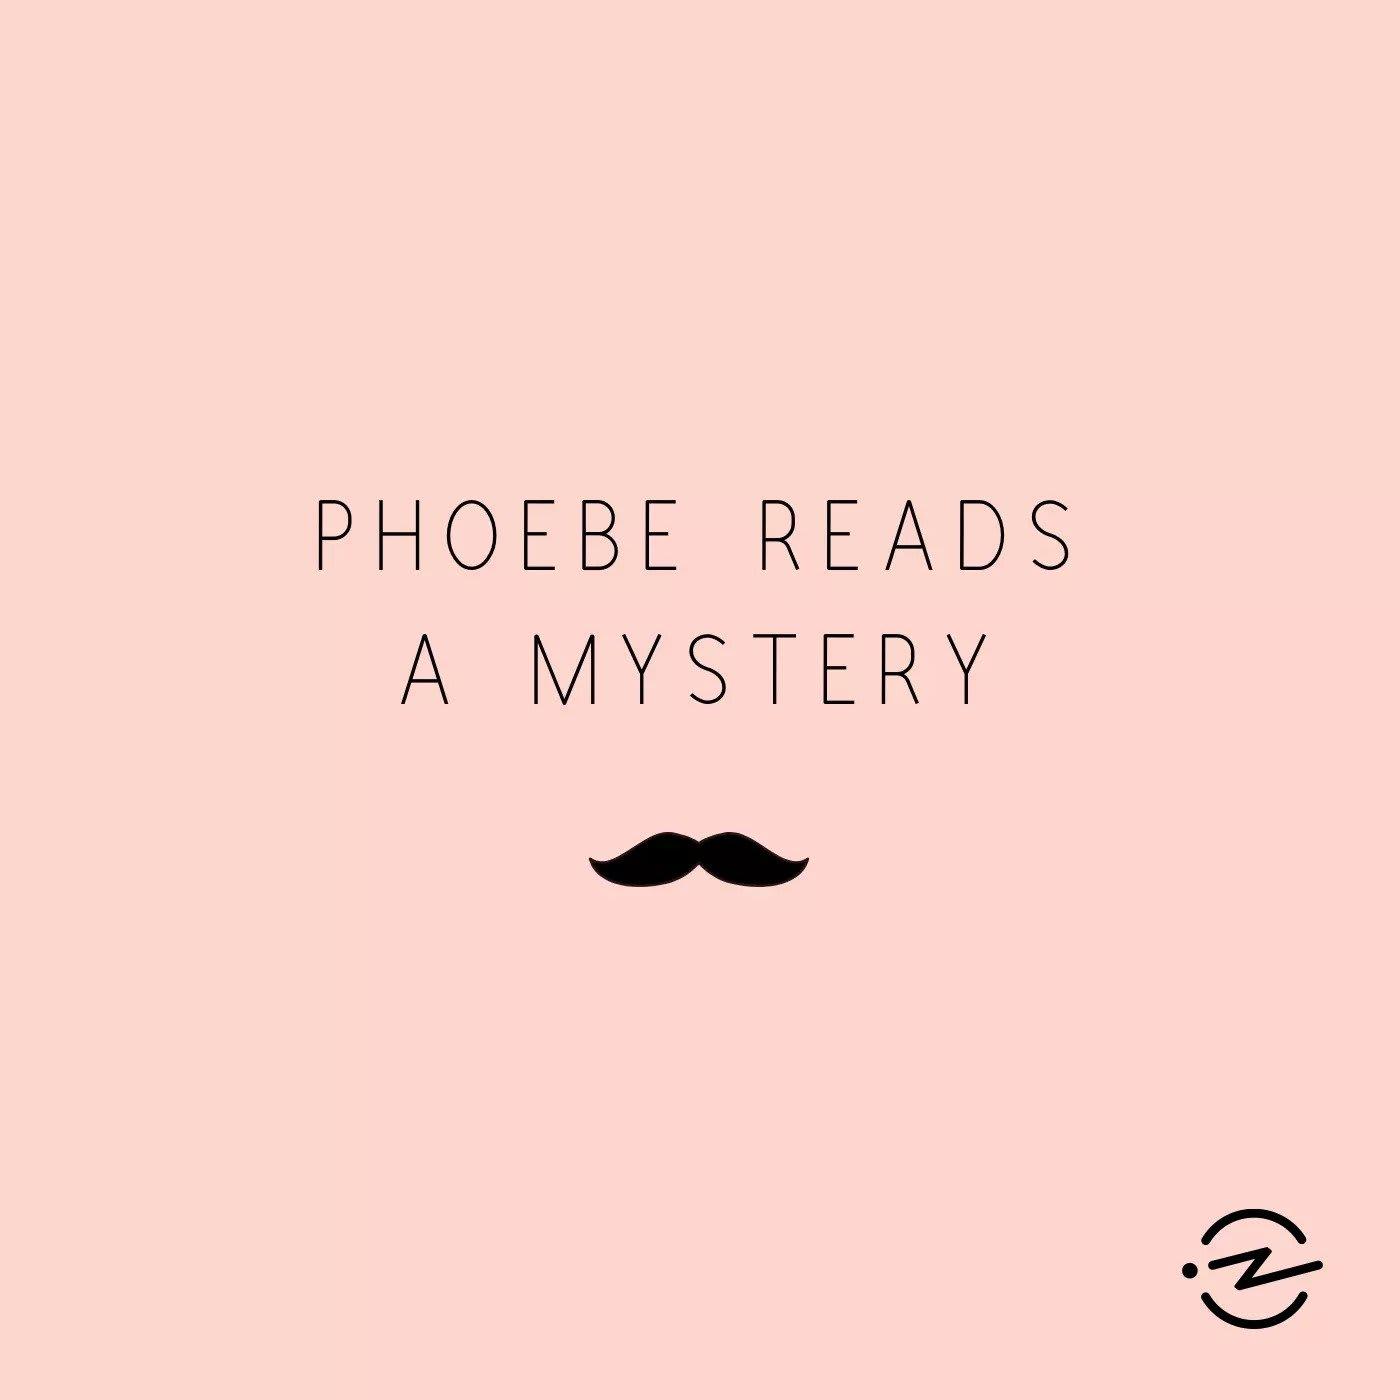 phobe reads a mystery podcast